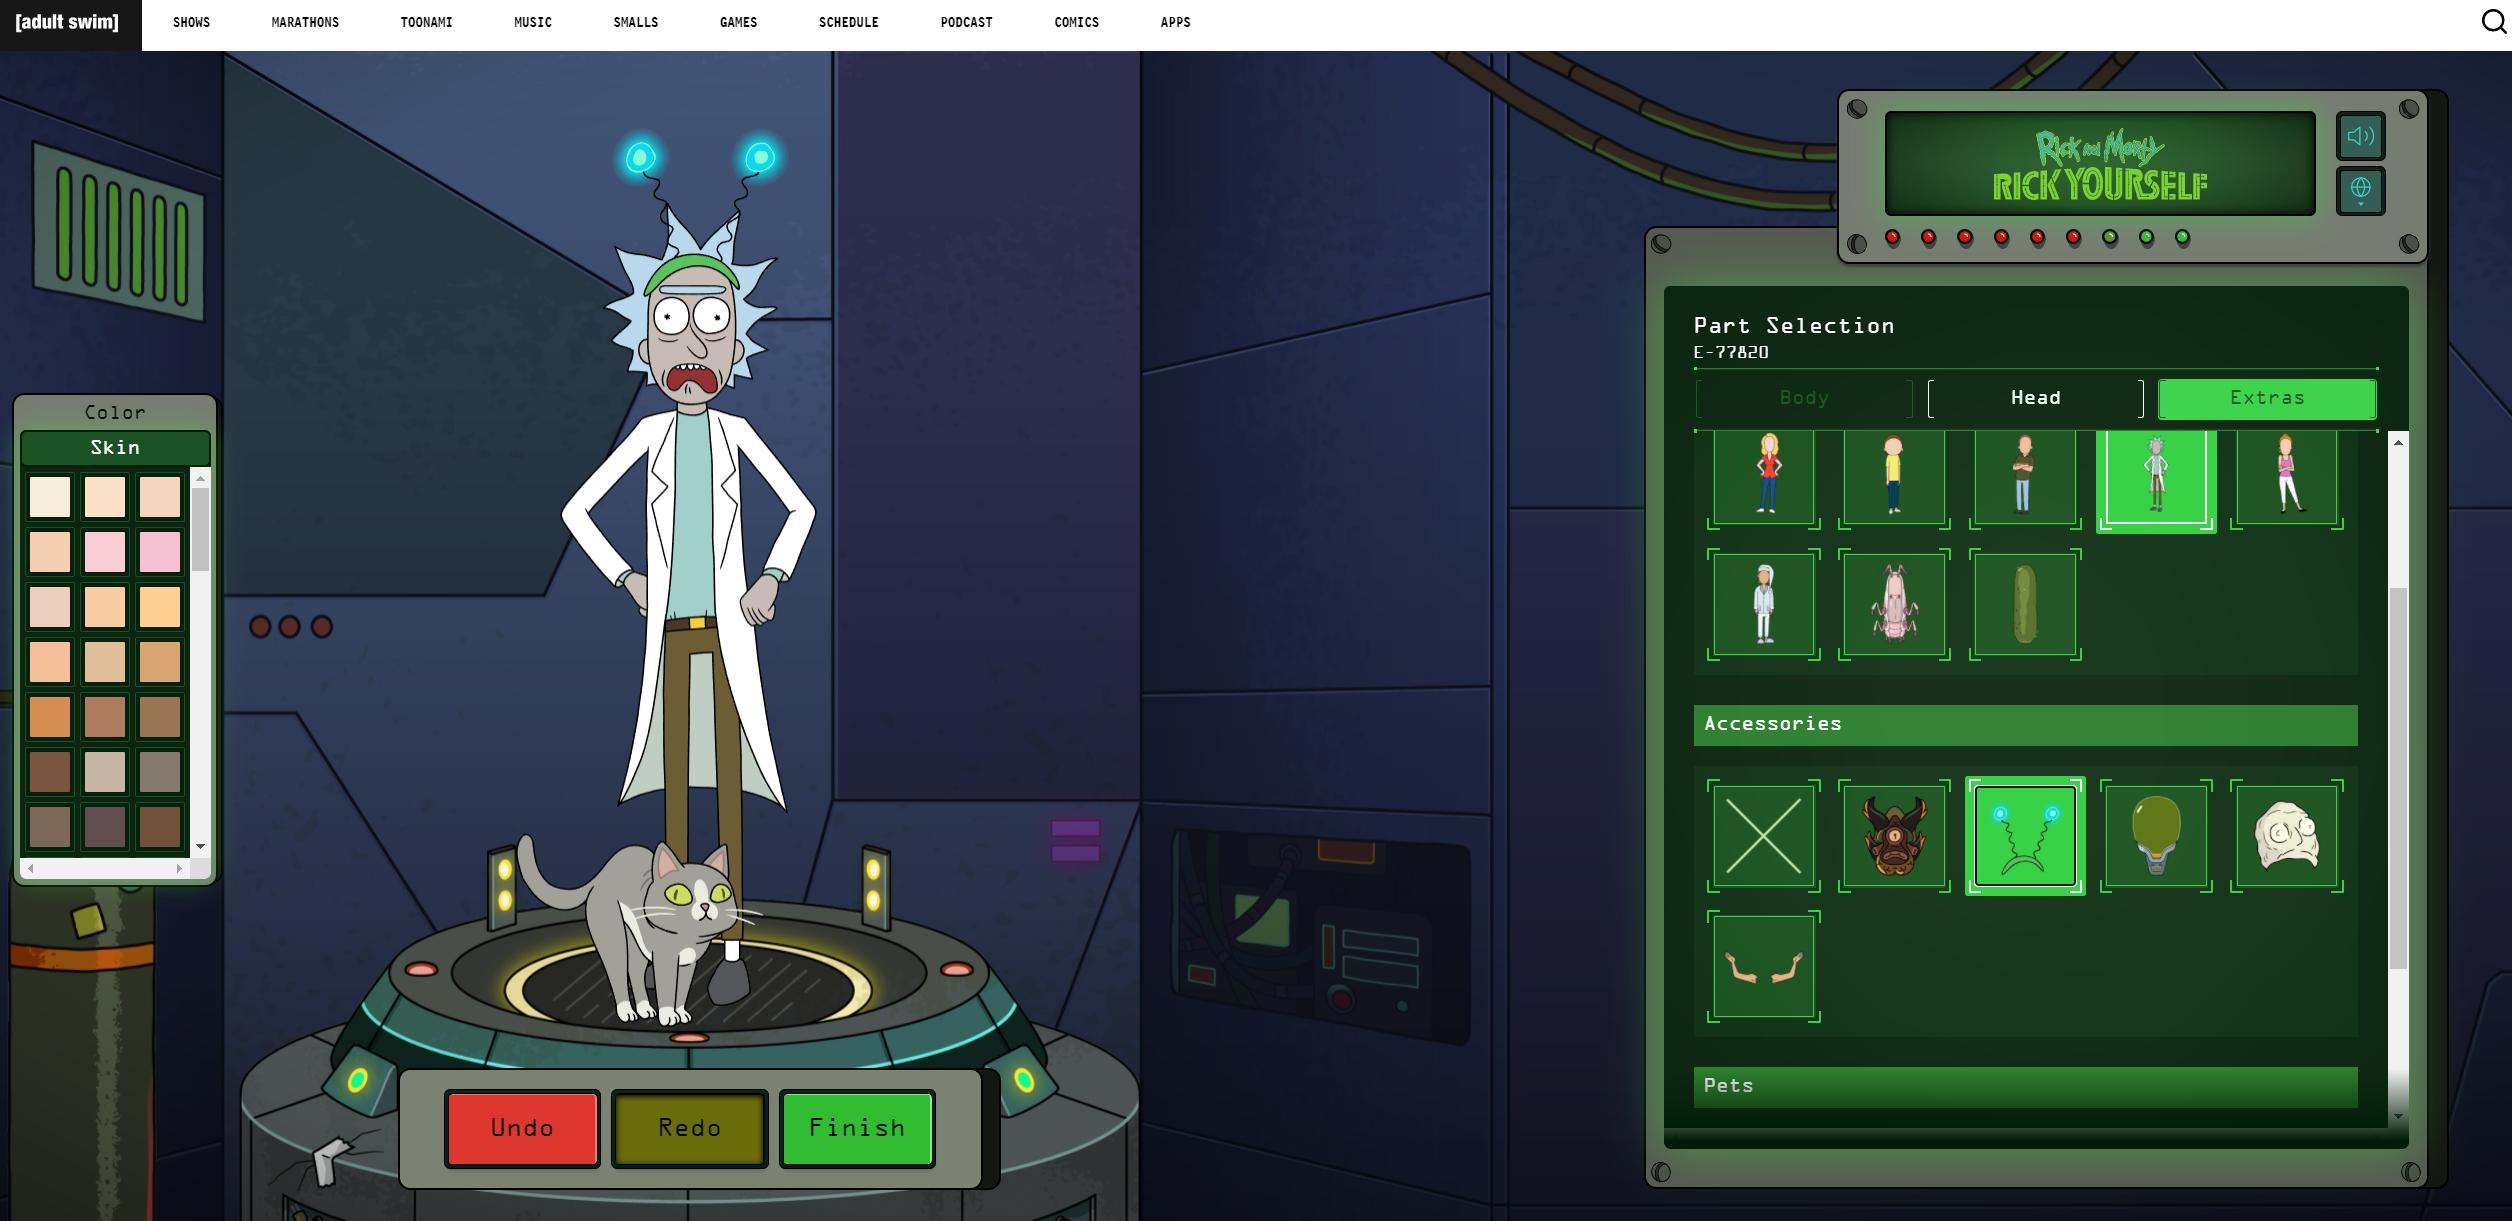 瑞克和莫蒂捏人小游戏(Rick and Morty Avatar Maker)